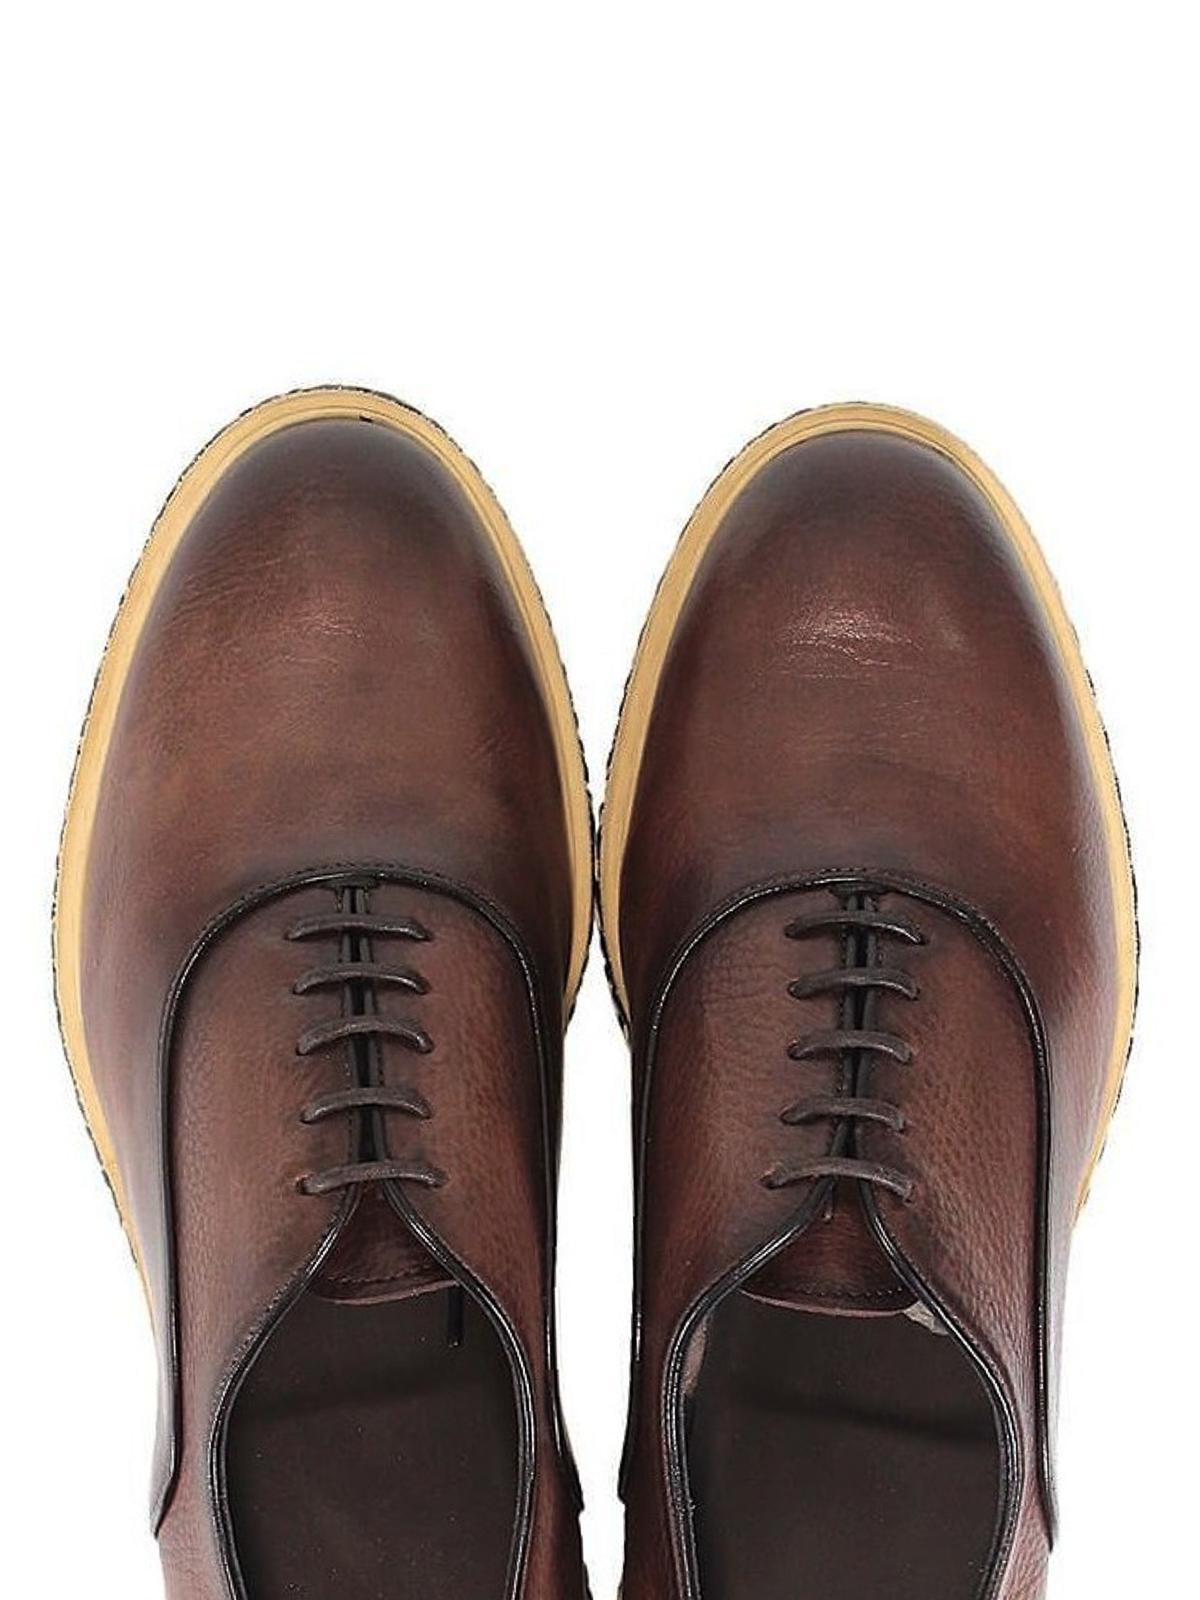 Santoni - Stringate in pelle marrone vintage - scarpe stringate - 14028 c5f380924f7